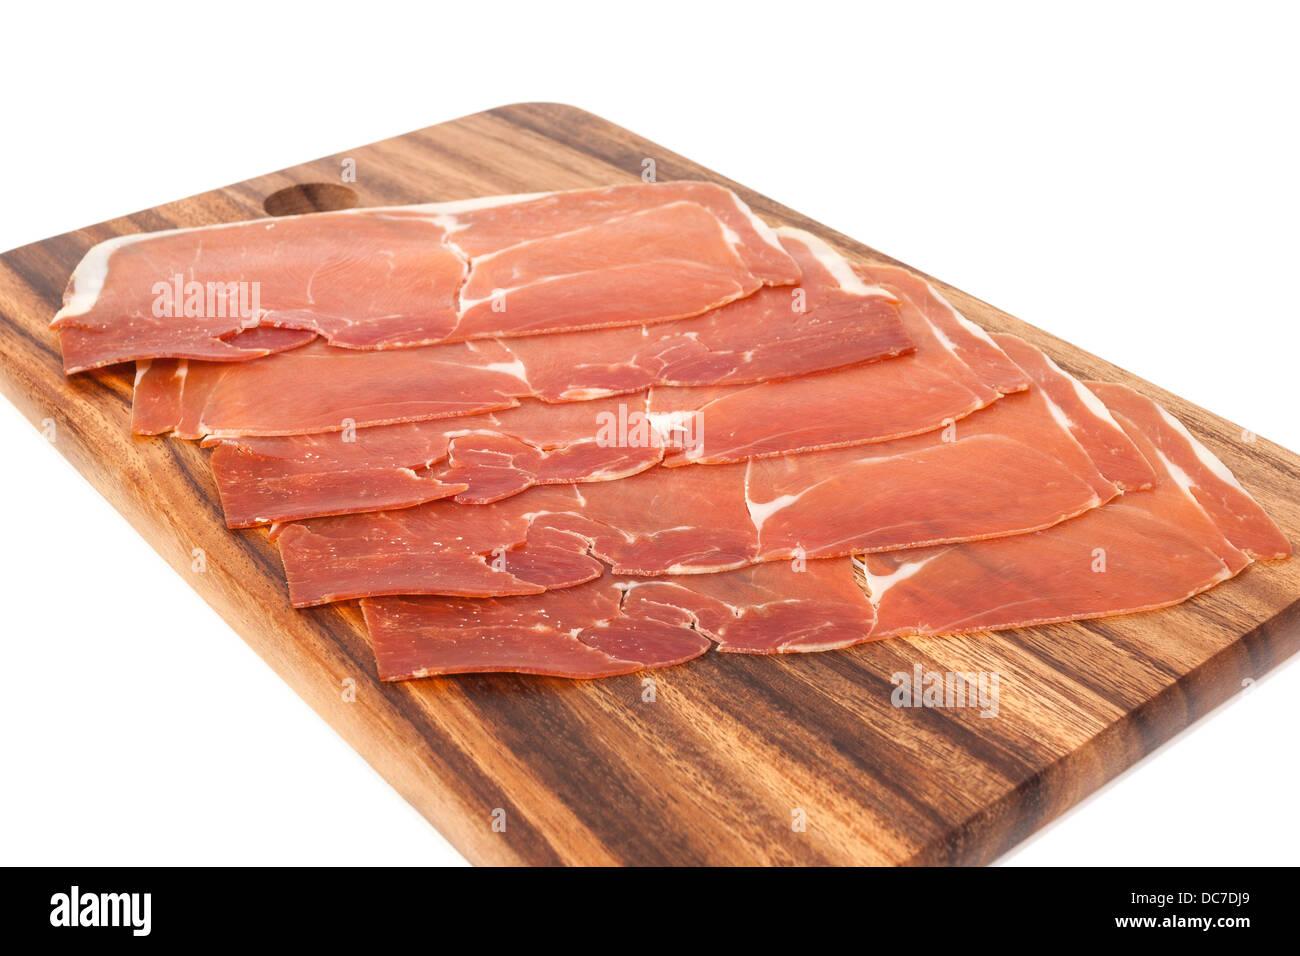 how to cook gammon ham steak